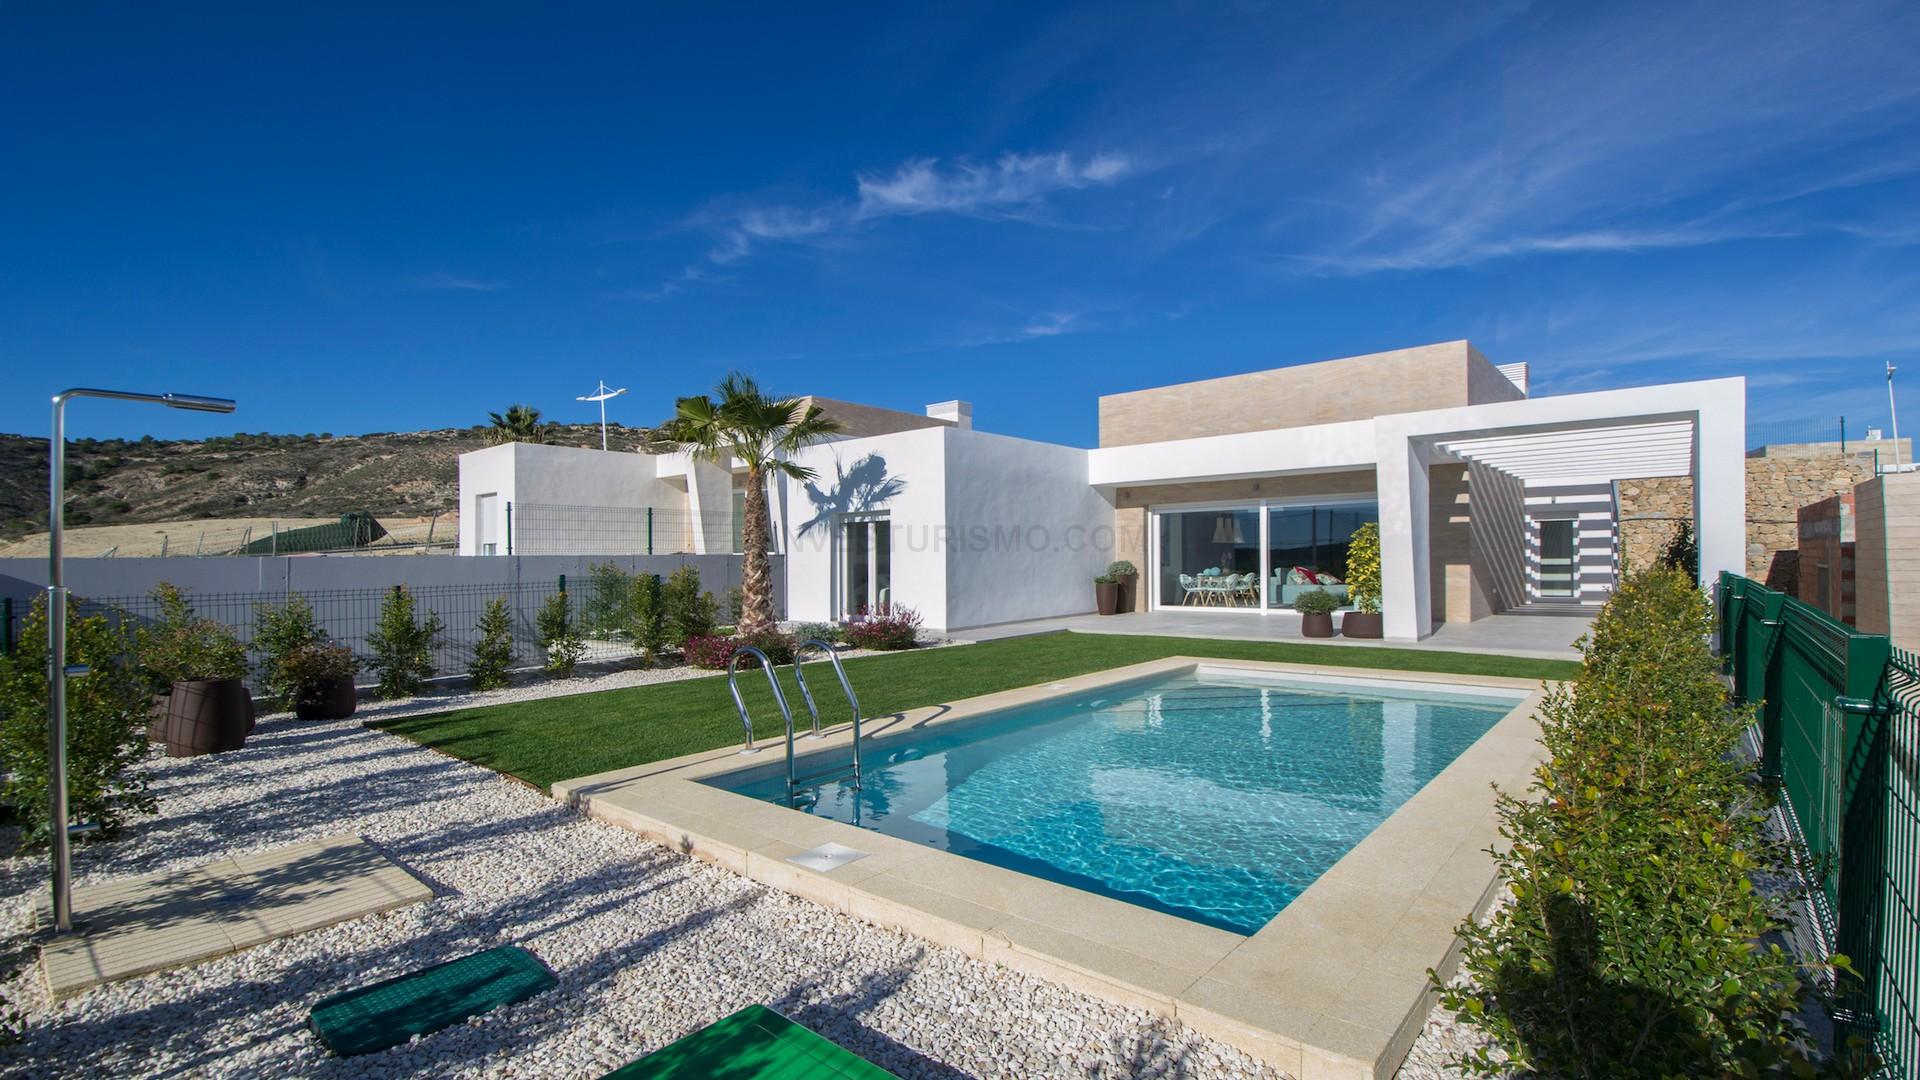 New Build Detached villa 3 bedrooms in Algorfa